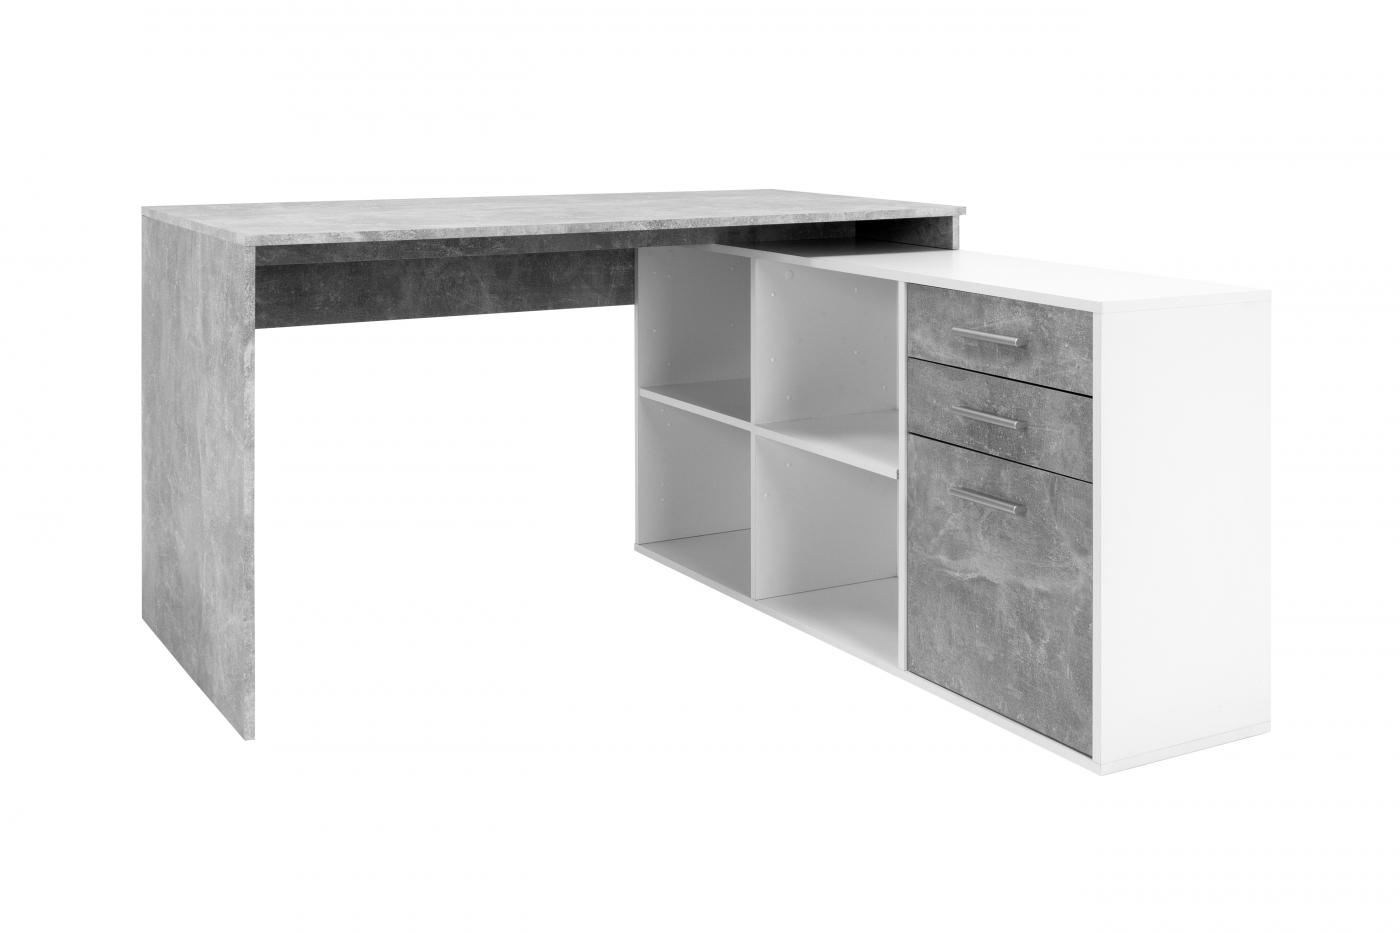 Pracovní stůl Theo, 136 cm, bílá / šedá